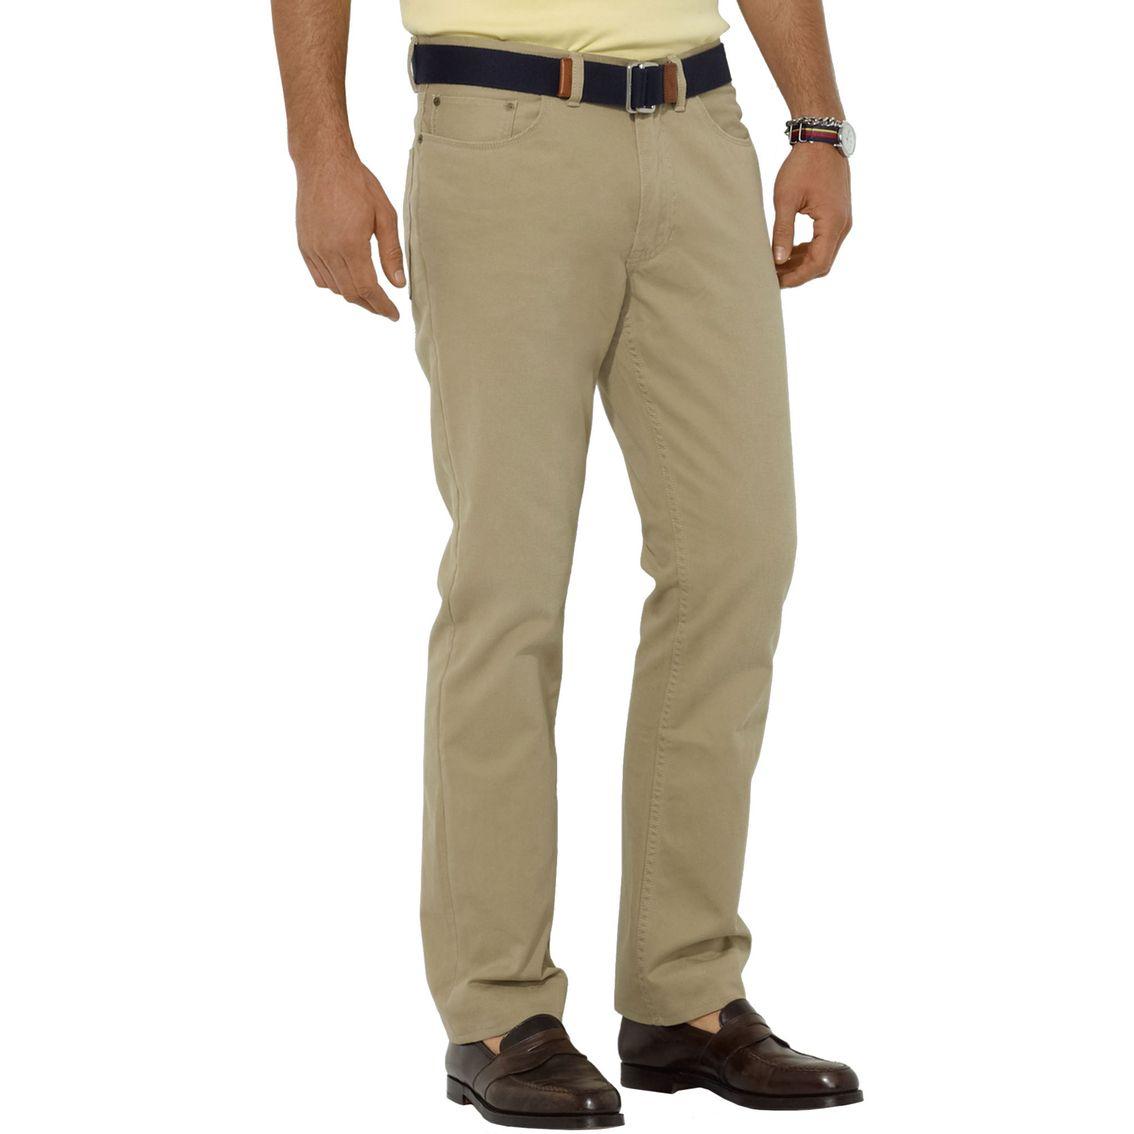 Polo Ralph Lauren Straight Fit 5 Pocket Chino Pants Pants Apparel Shop The Exchange Core Pants Chinos Pants Polo Ralph Lauren